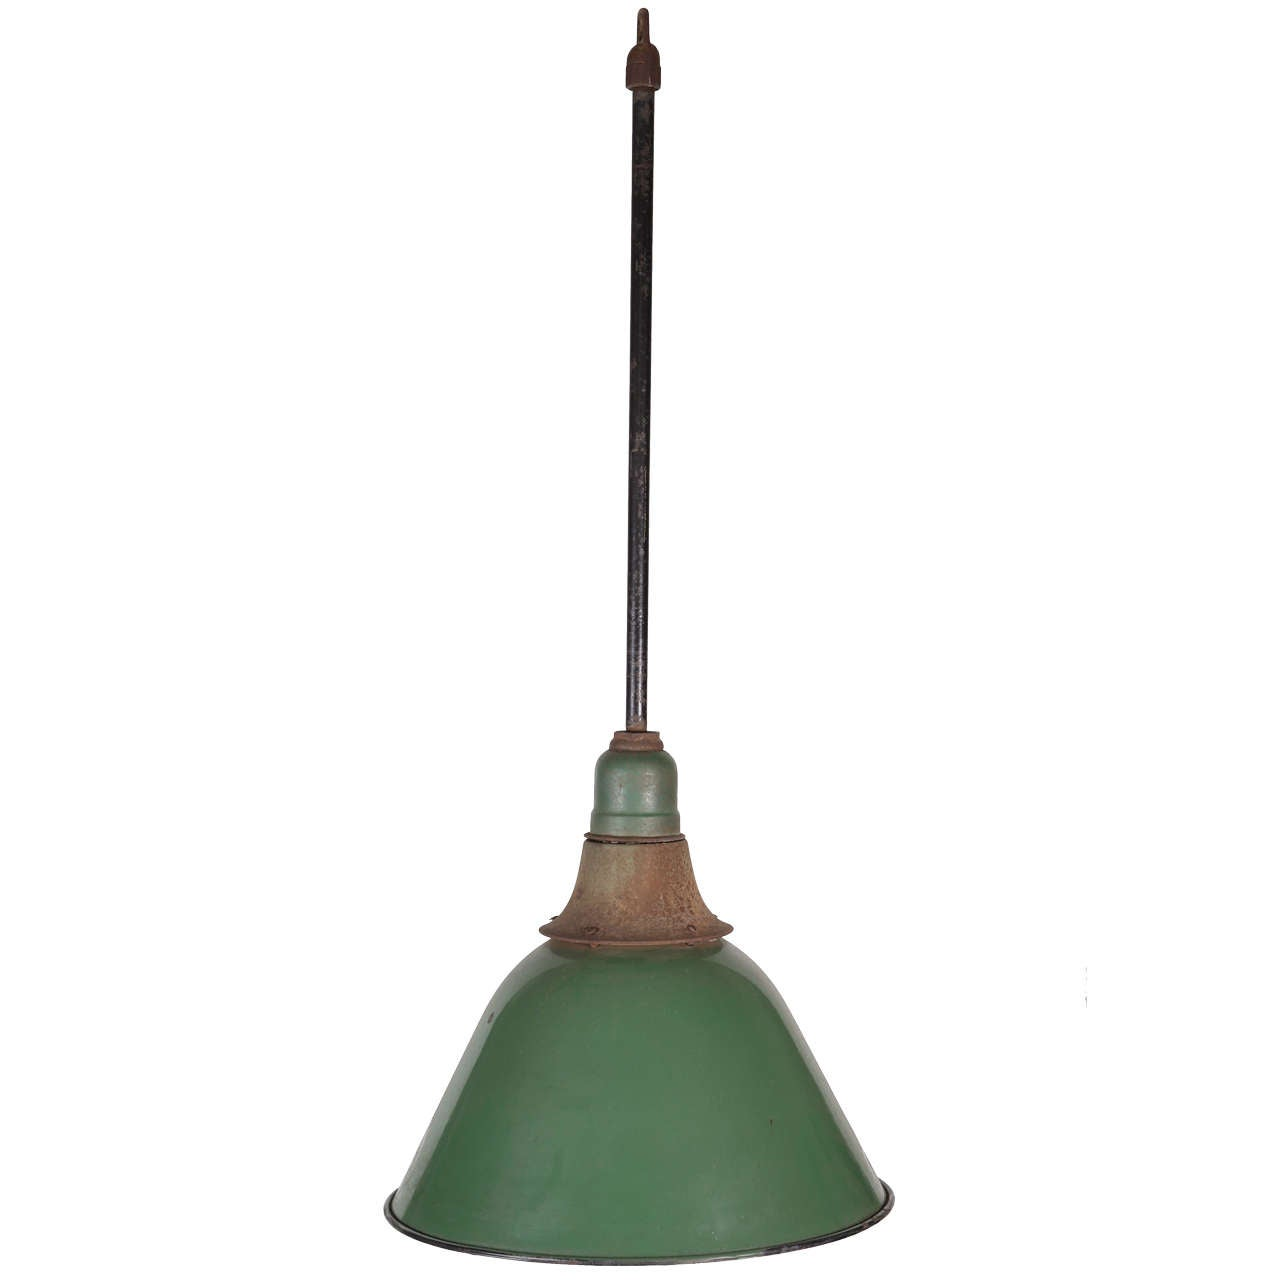 Green Enamel Bell Shaped Warehouse Light For Sale At 1stdibs